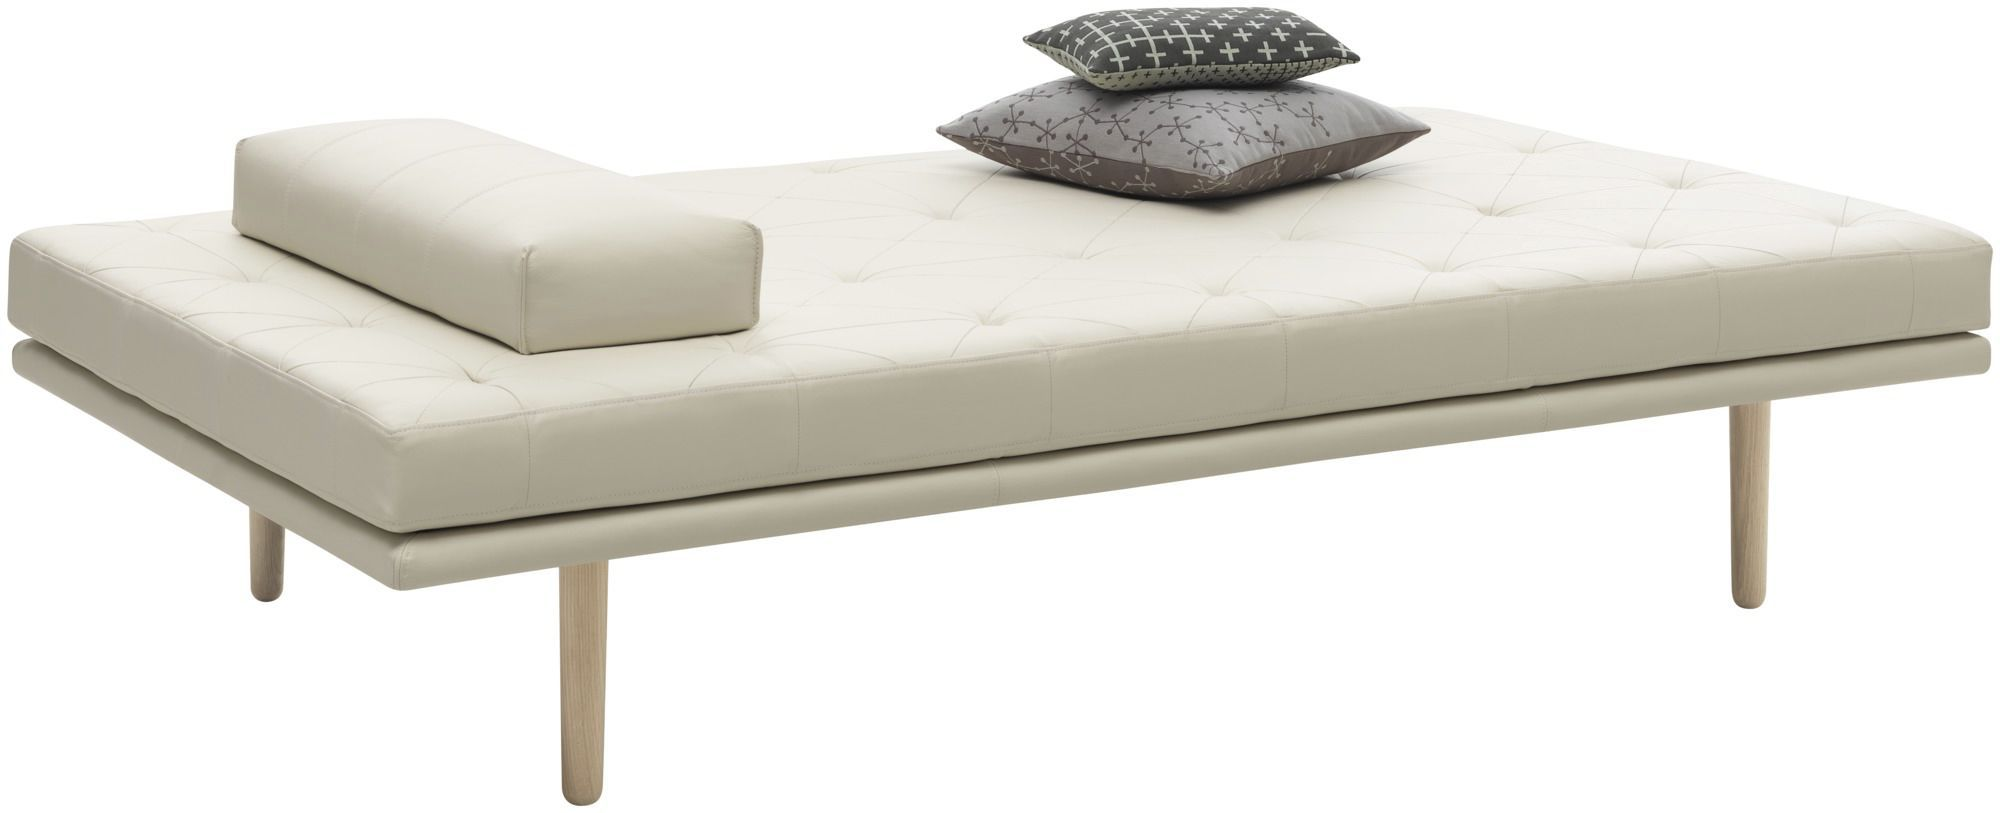 Boconcept De contemporary day bed leather fabric fusion boconcept